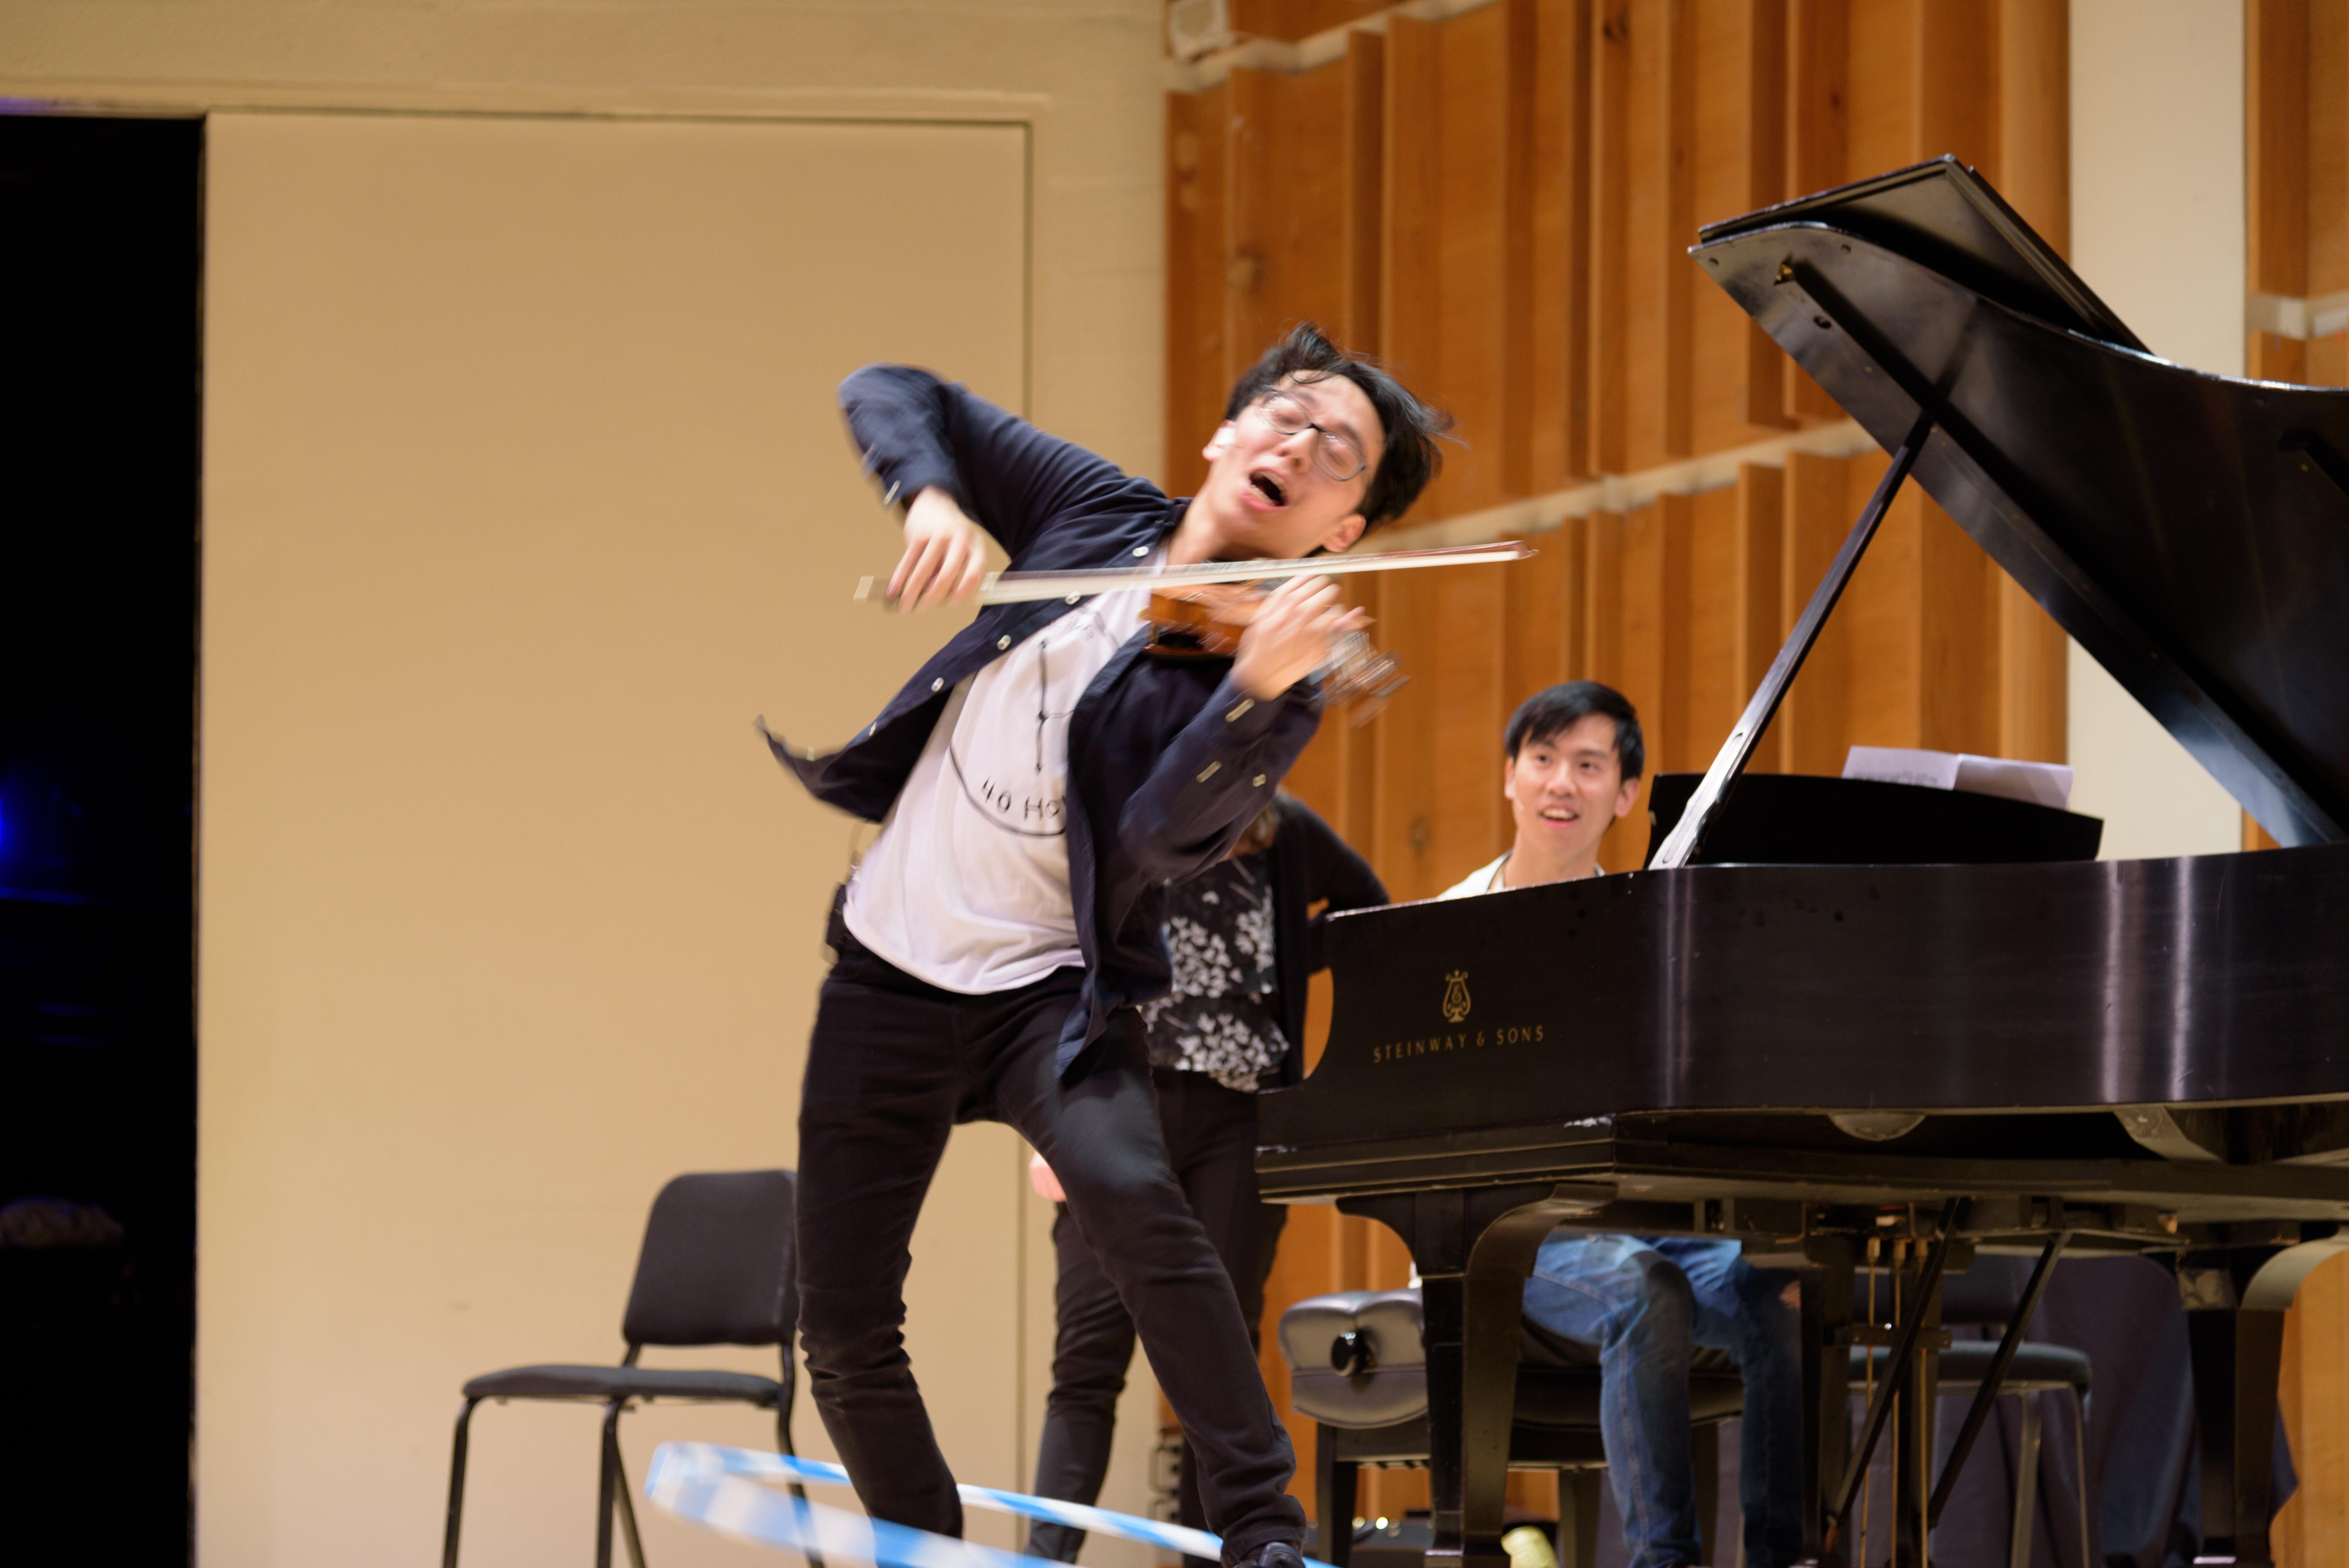 TwoSet Violin - Wikipedia